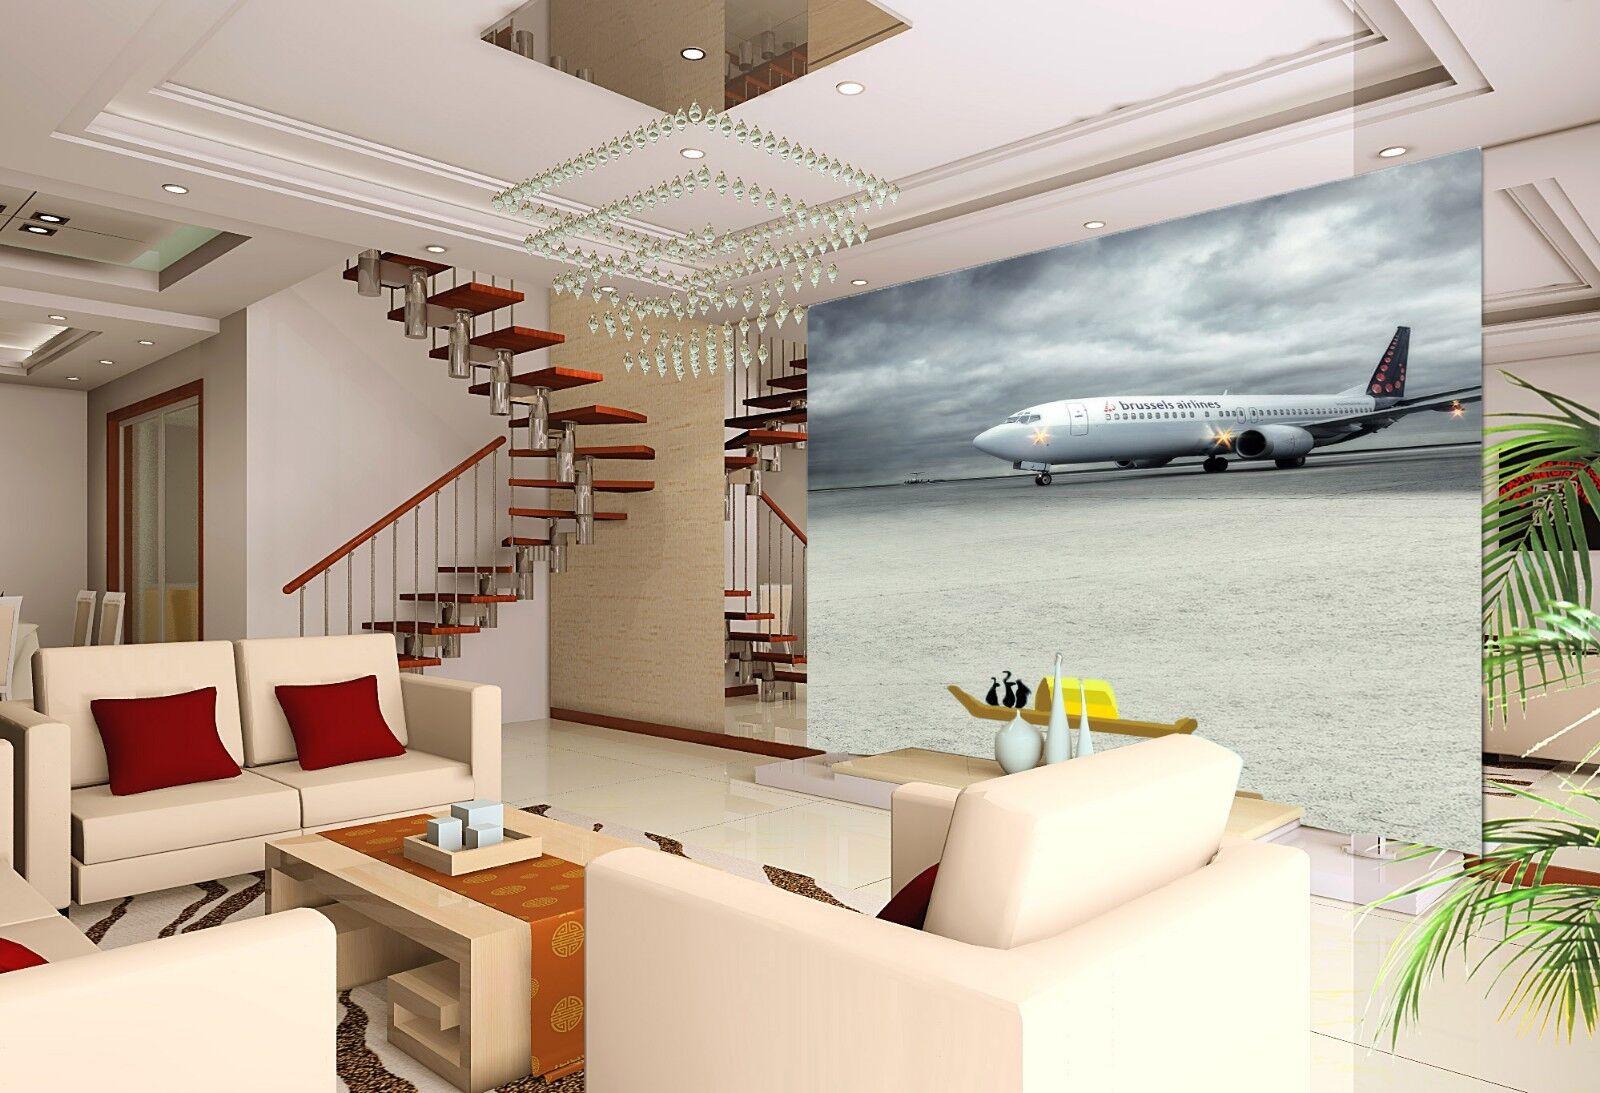 3D Aircraft 4336 Wallpaper Murals Wall Print Wallpaper Mural AJ WALL UK Lemon